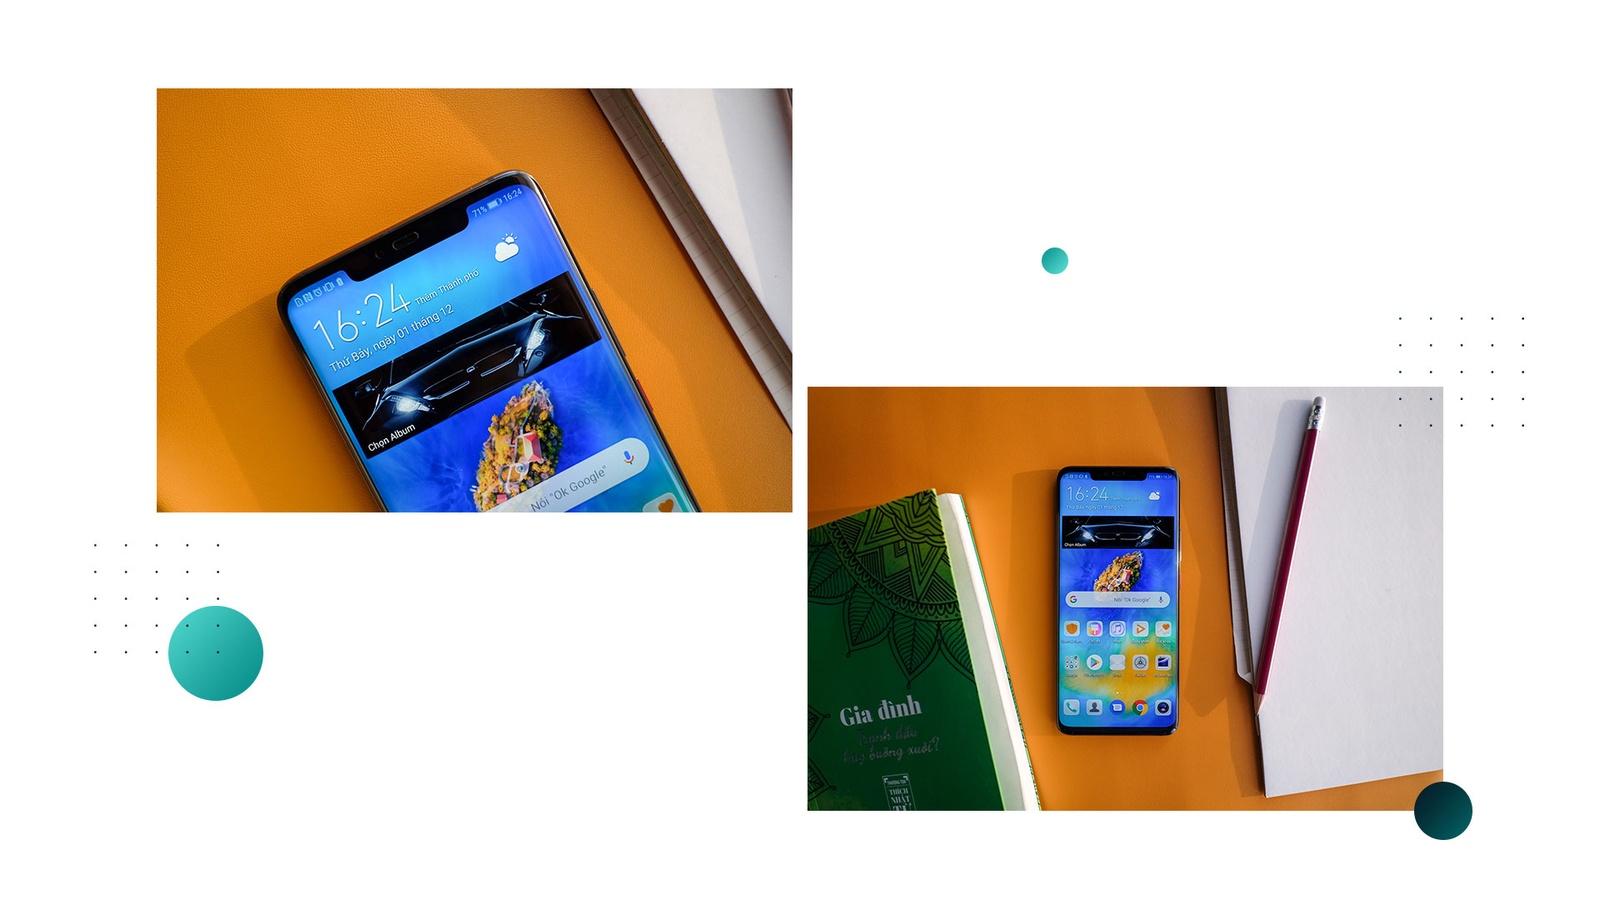 Huawei Mate 20 Pro - khac biet co thuc su can thiet? hinh anh 3